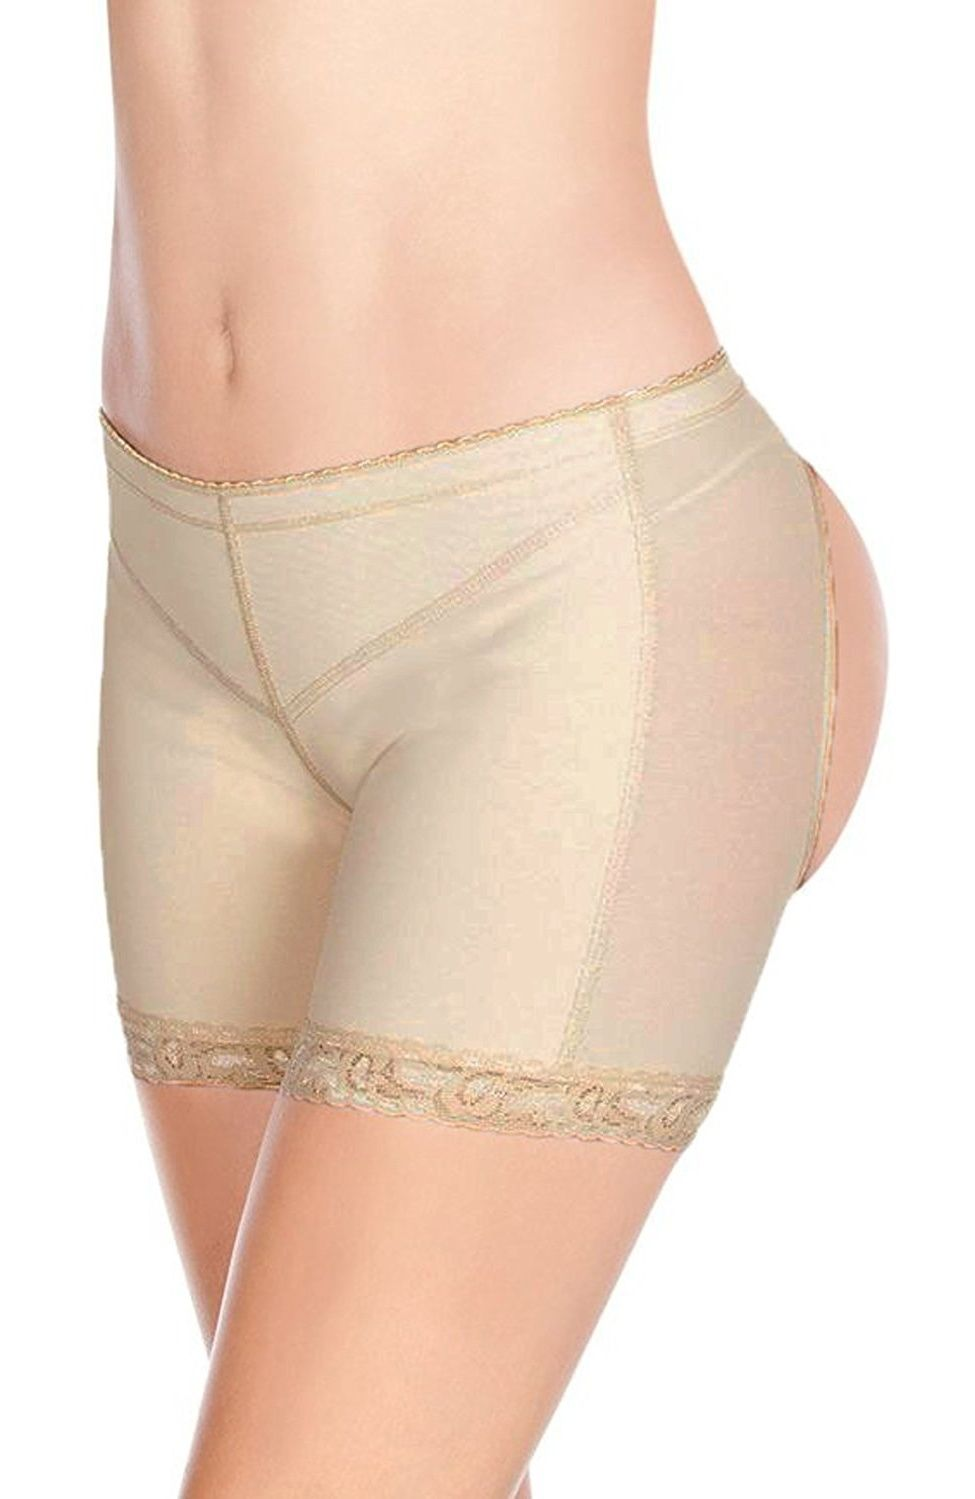 6979cbc4ac SAYFUT Womens Ultra Firm Control Shapewear Seamless Butt Lifter Boyshorts  Tummy Waist Trainer Shaper Panties Plus